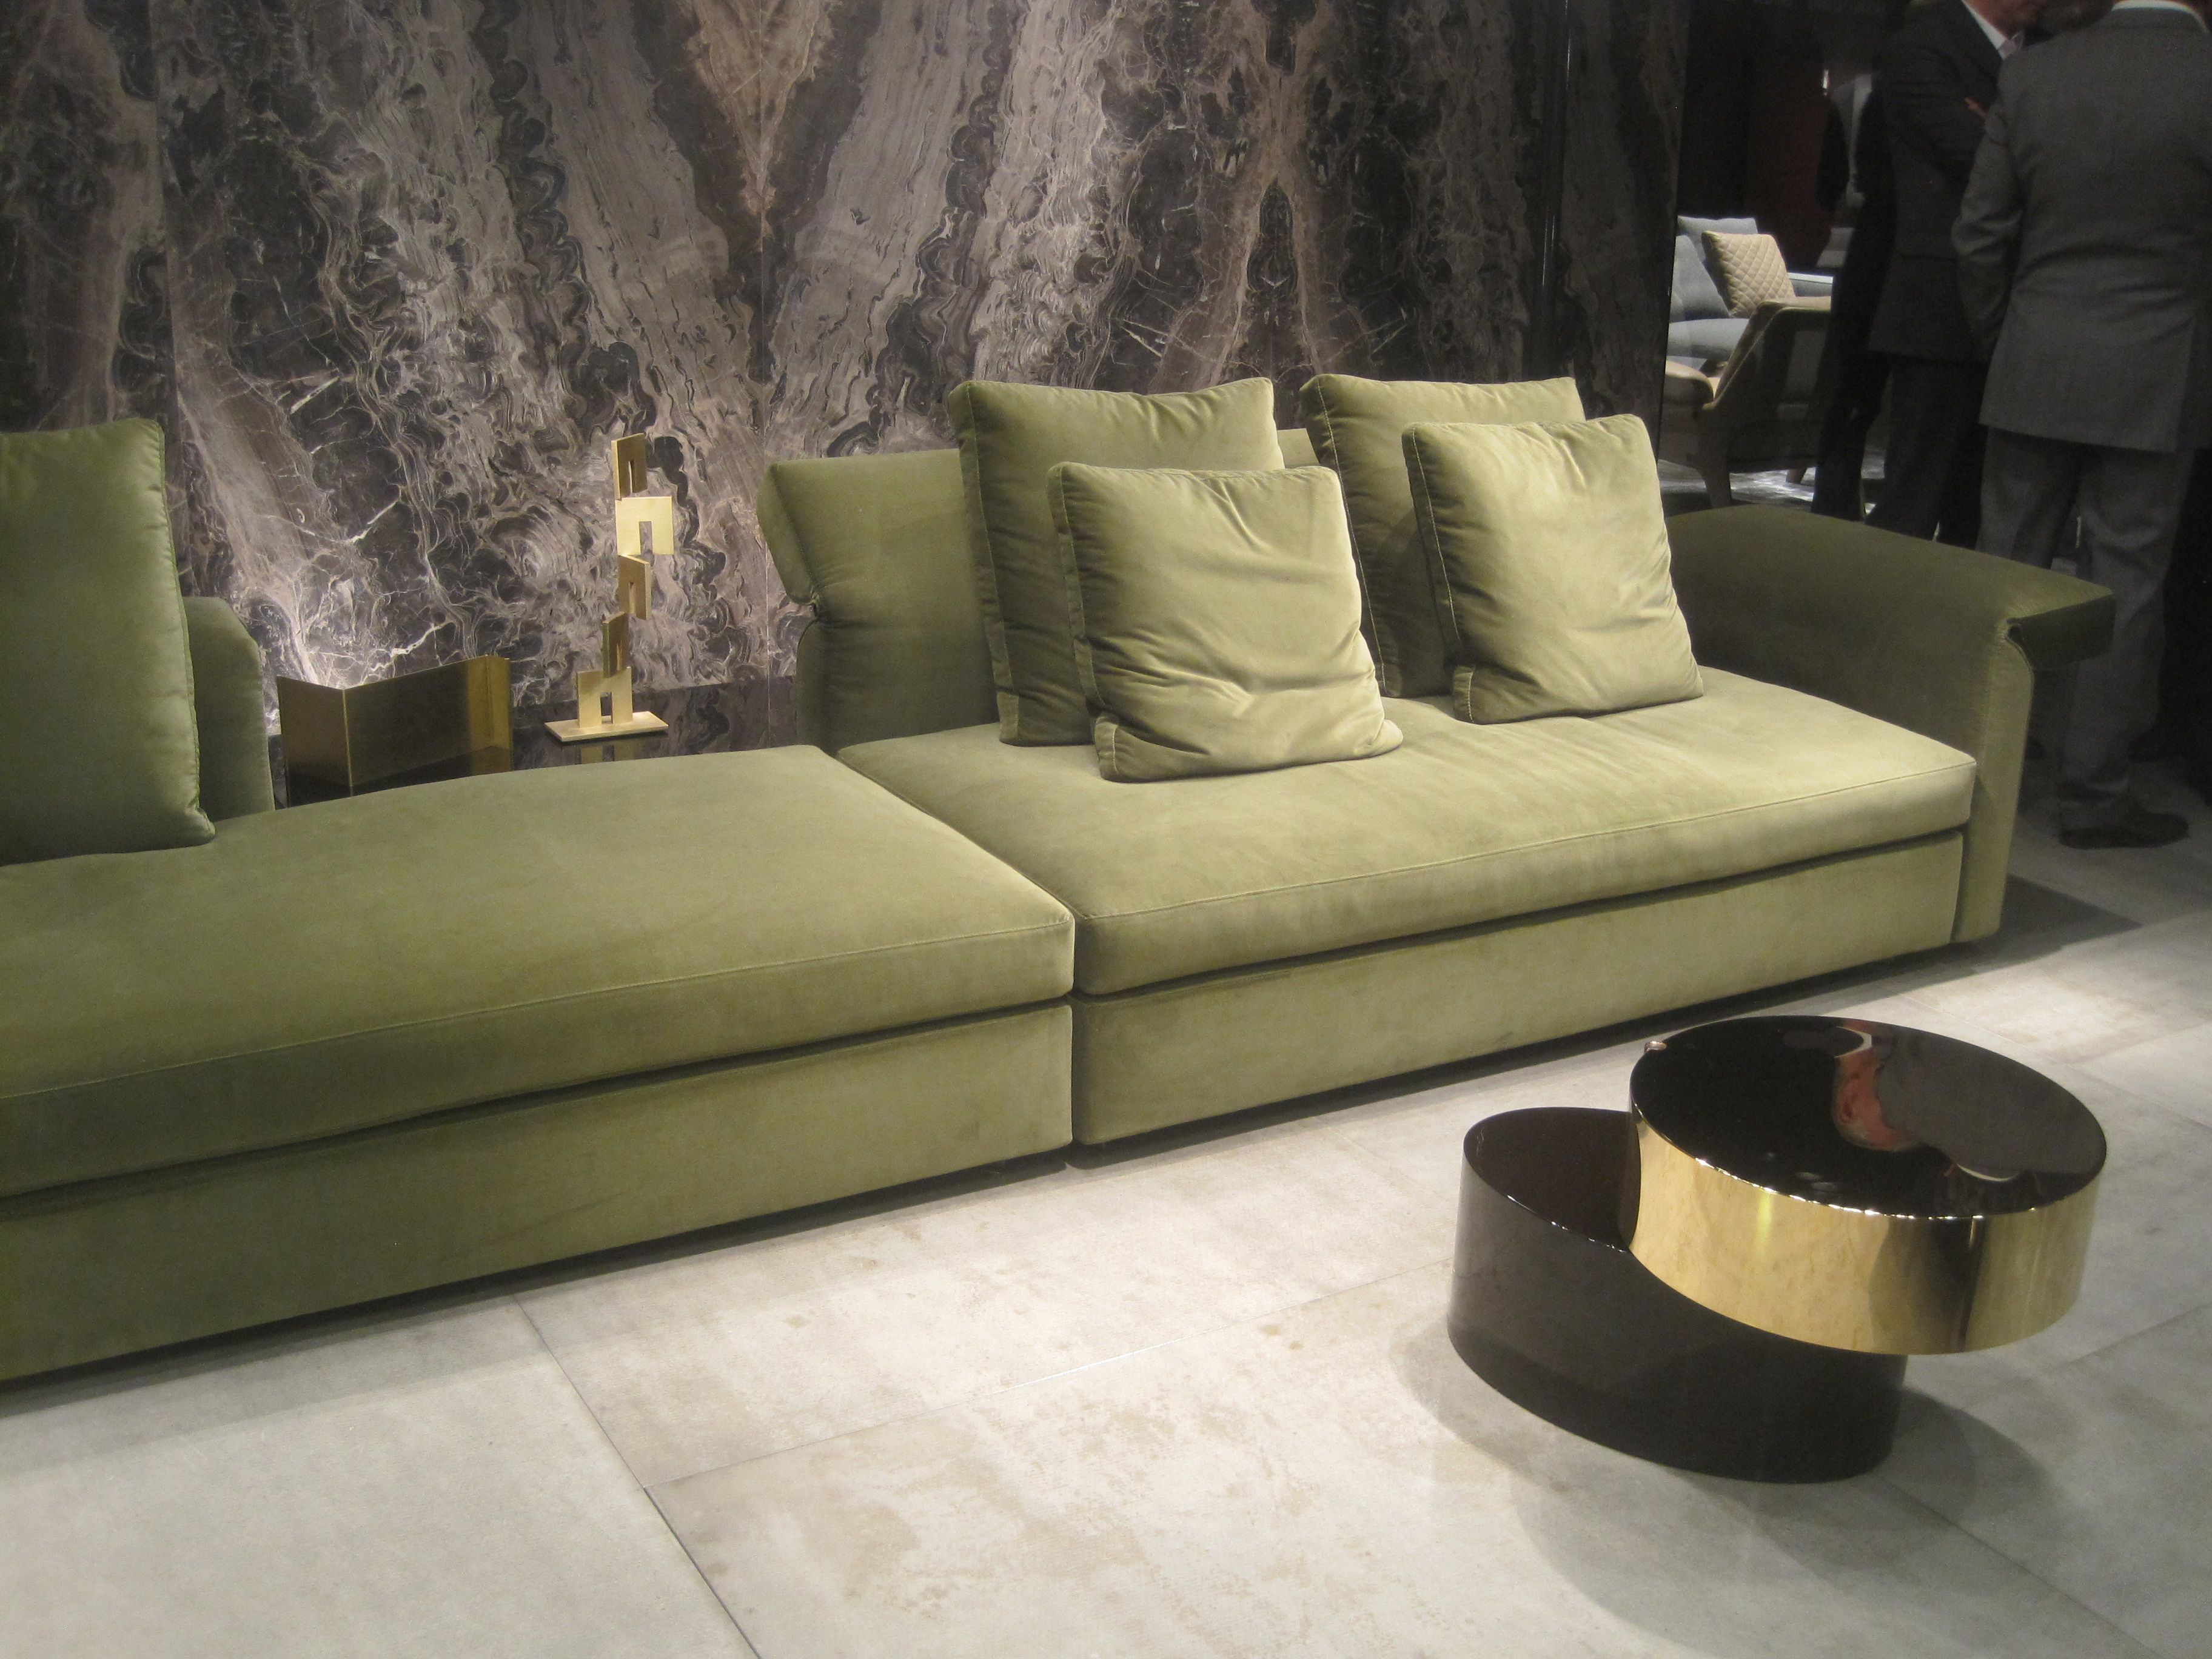 Minotti Collar New Sofa Banken Noort Interieur Pinterest